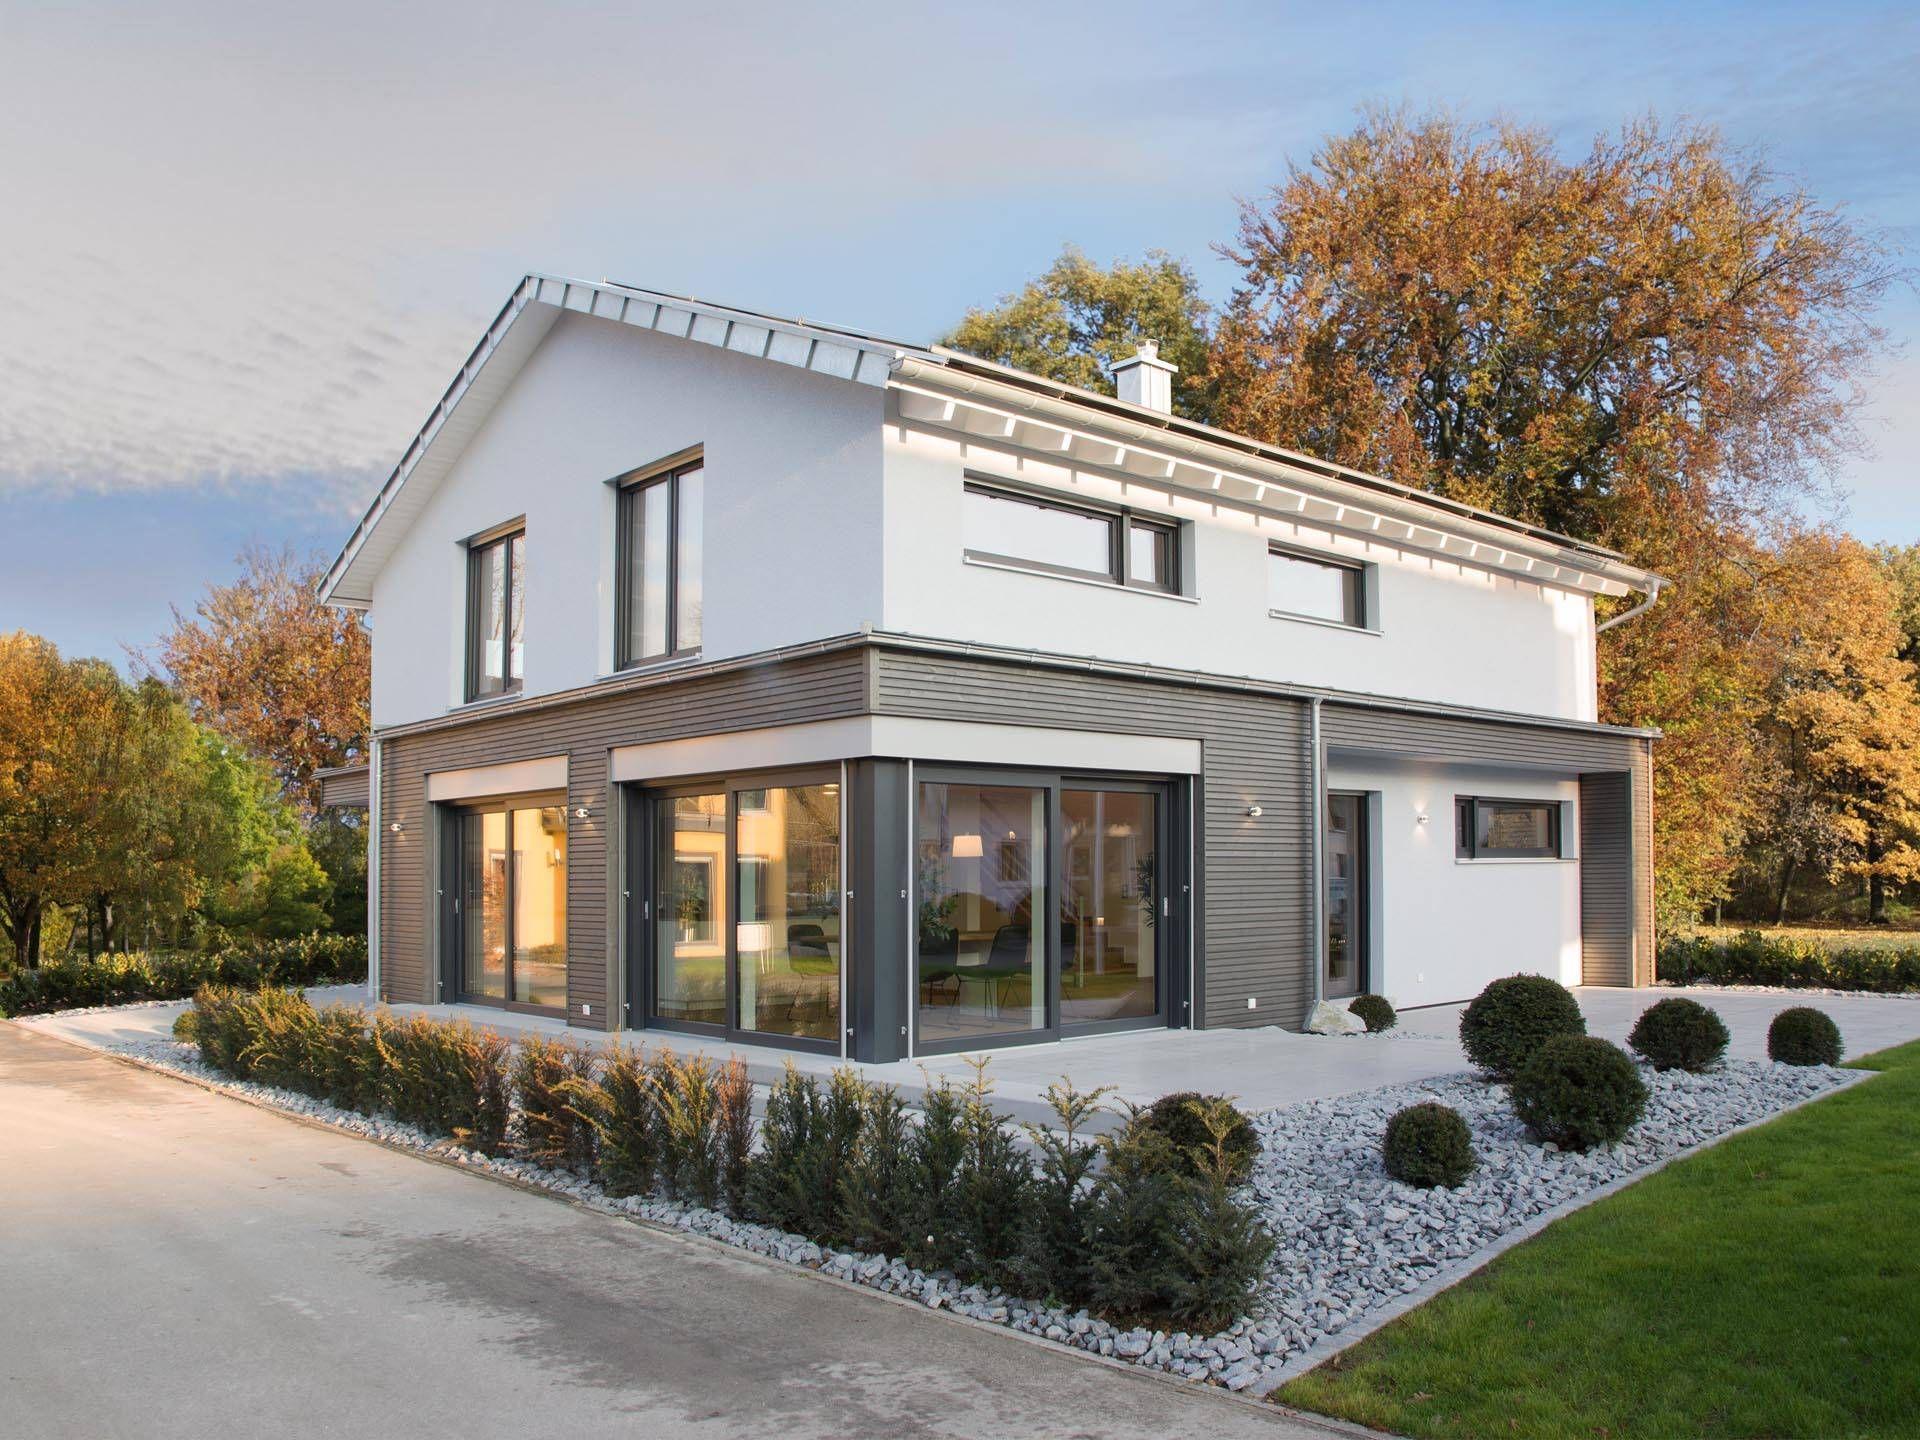 Musterhaus ulm musterhaus von fertighaus weiss for Hausbau raumplanung